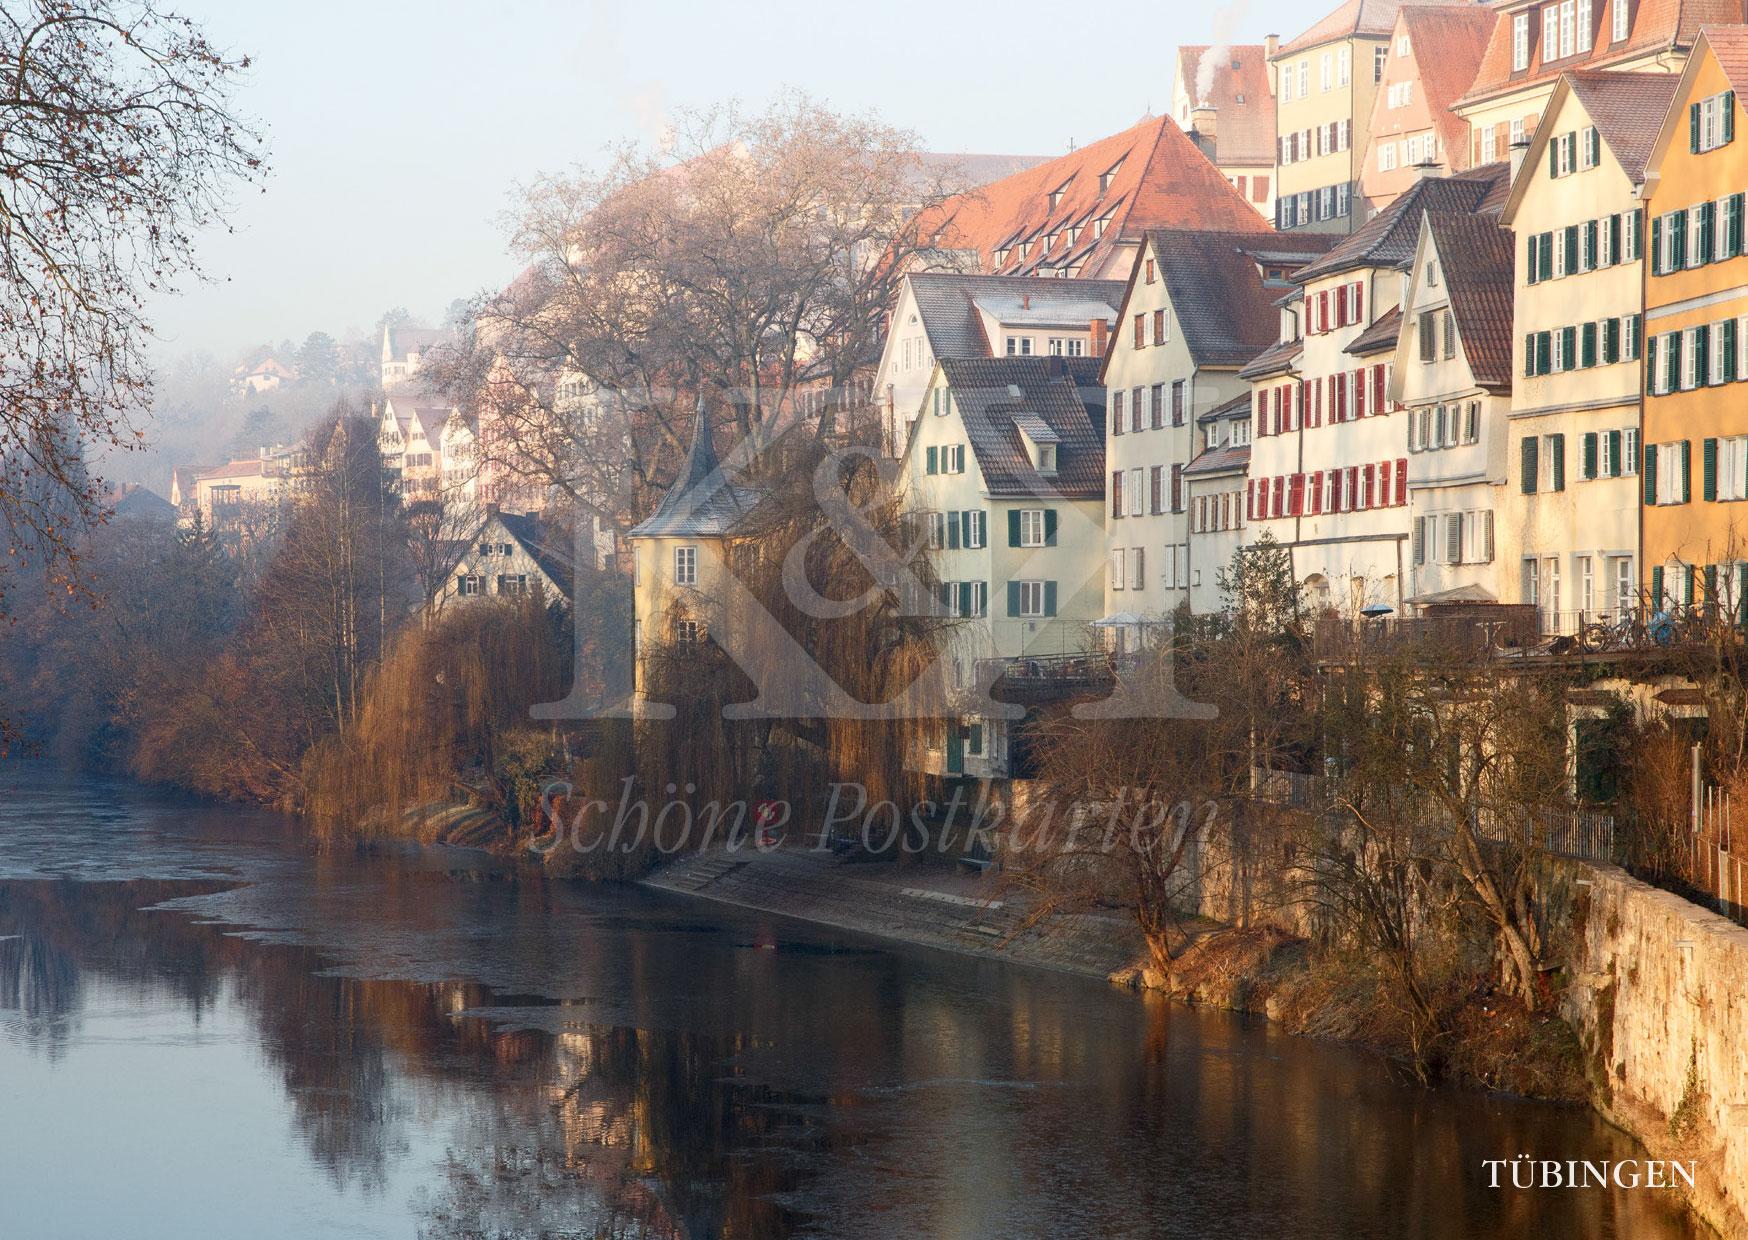 Hölderinturm mit Neckarfront in Tübingen | Schöne Postkarten Nr. 208